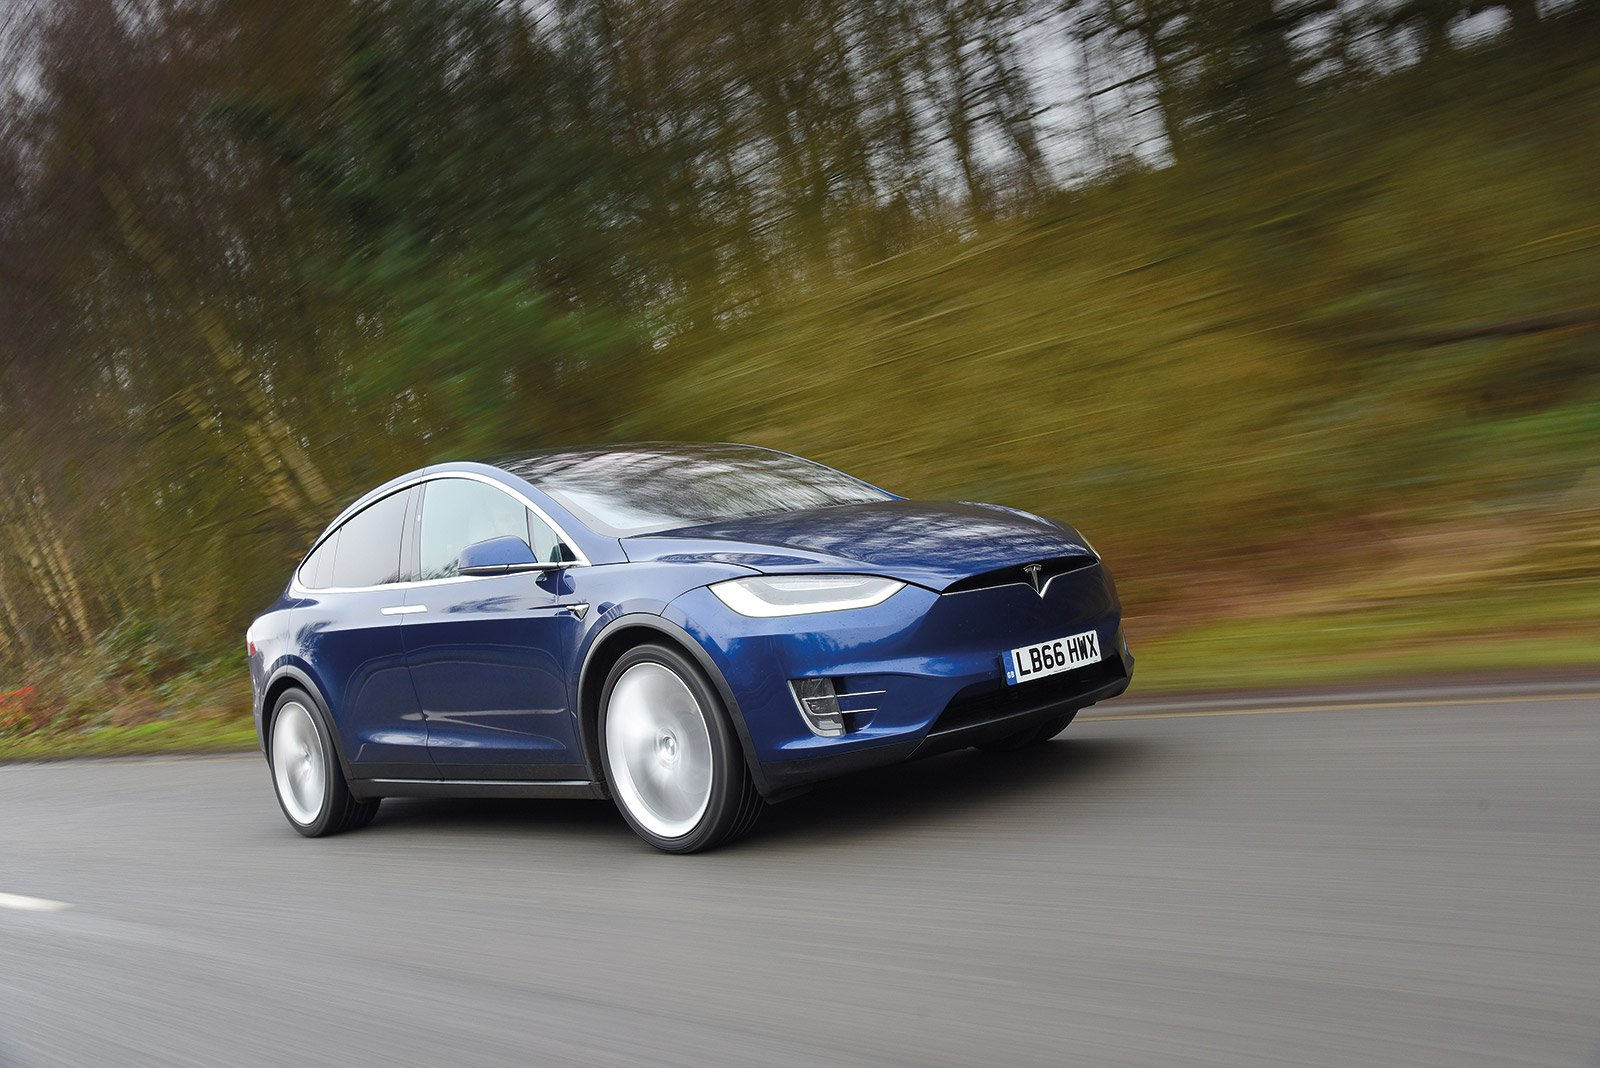 SEVEN-SEATER: Tesla Model X (7 seat)